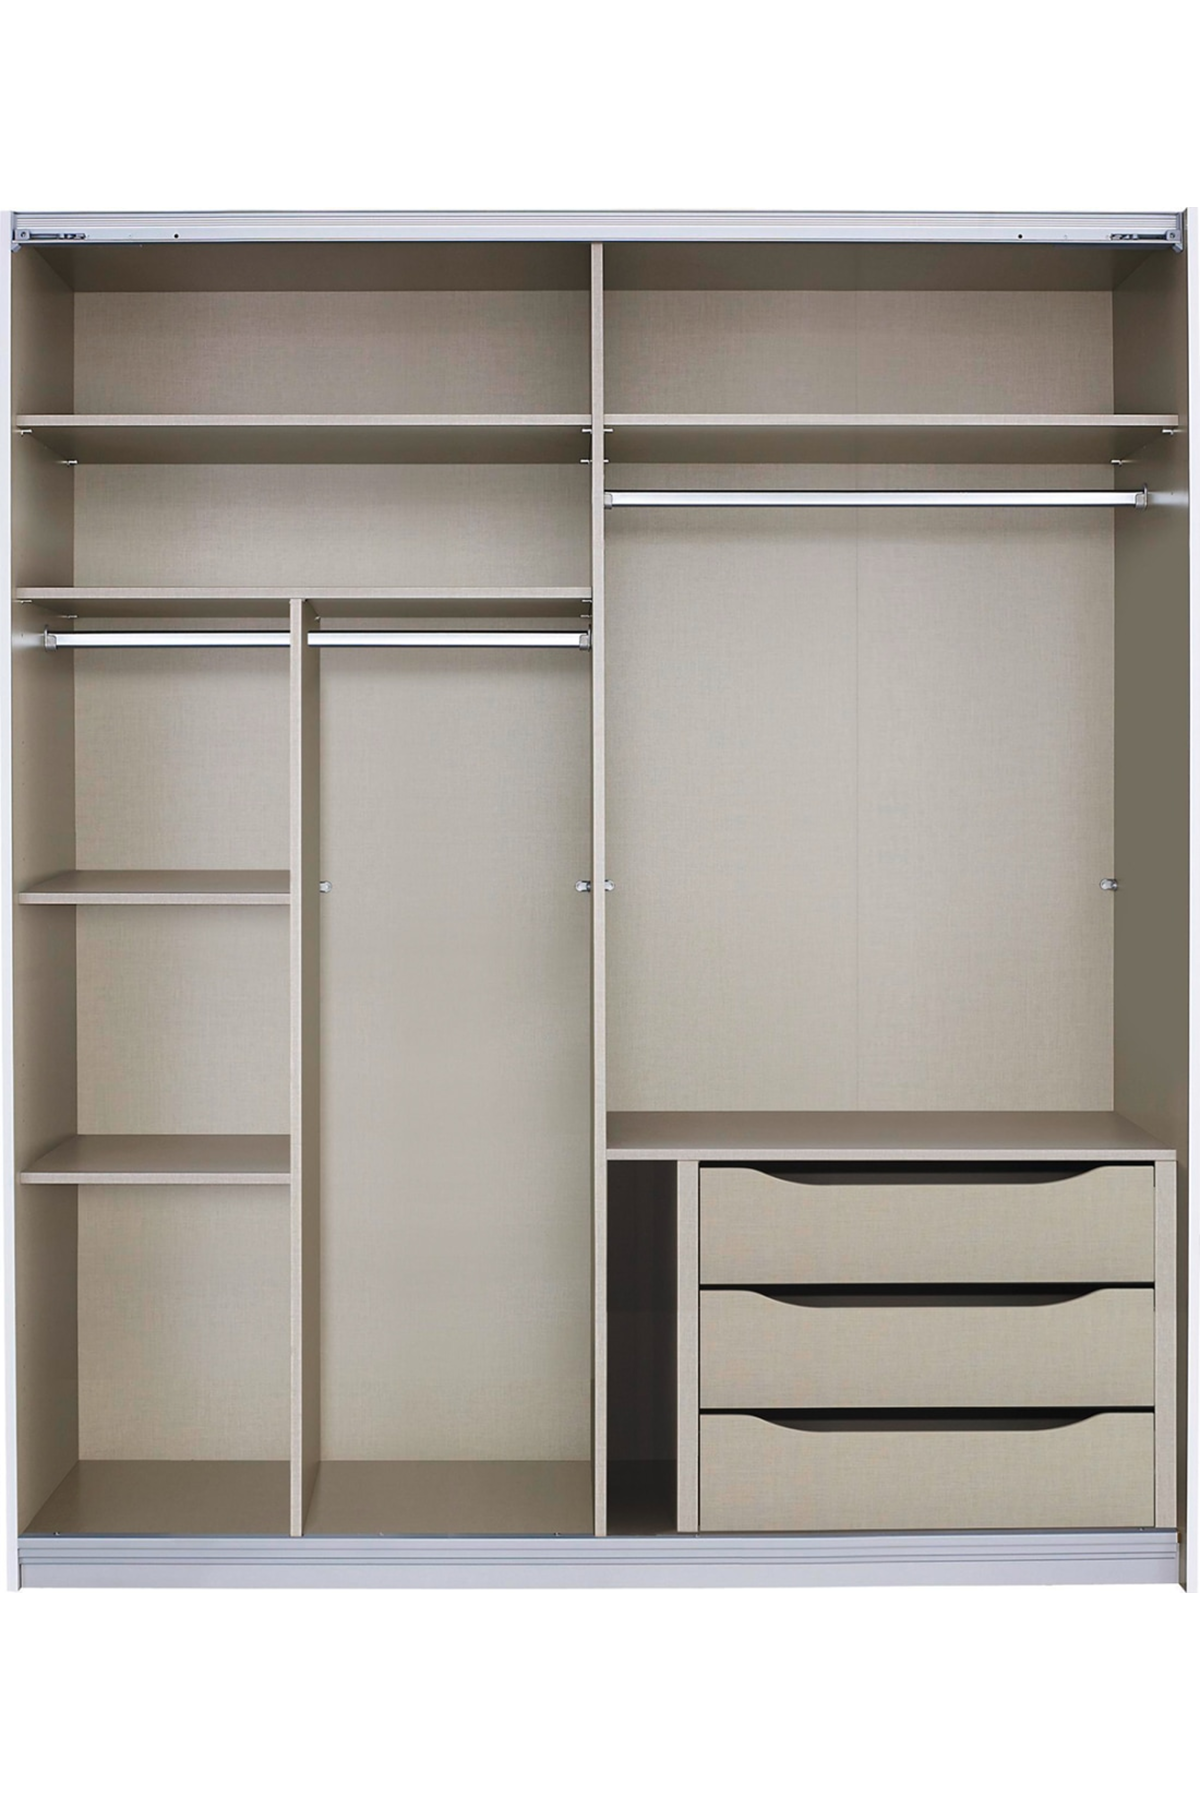 Malix 181cm Sliding Wardrobe Premium Interior Package Wardrobe